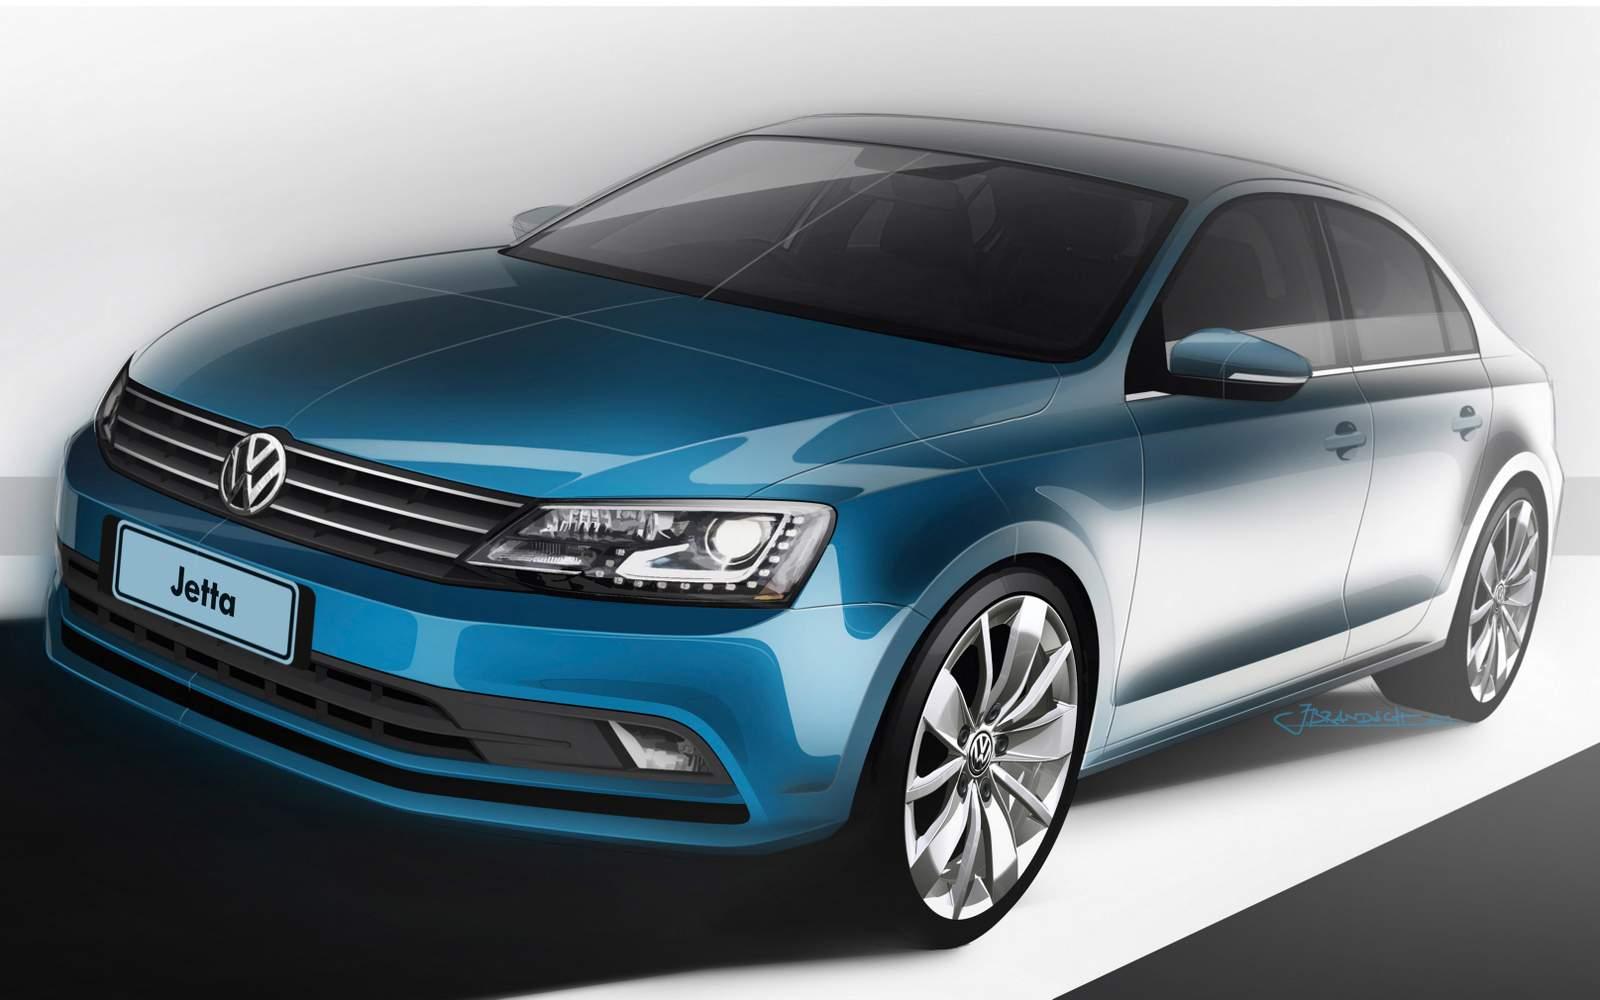 Novo VW Jetta 2015